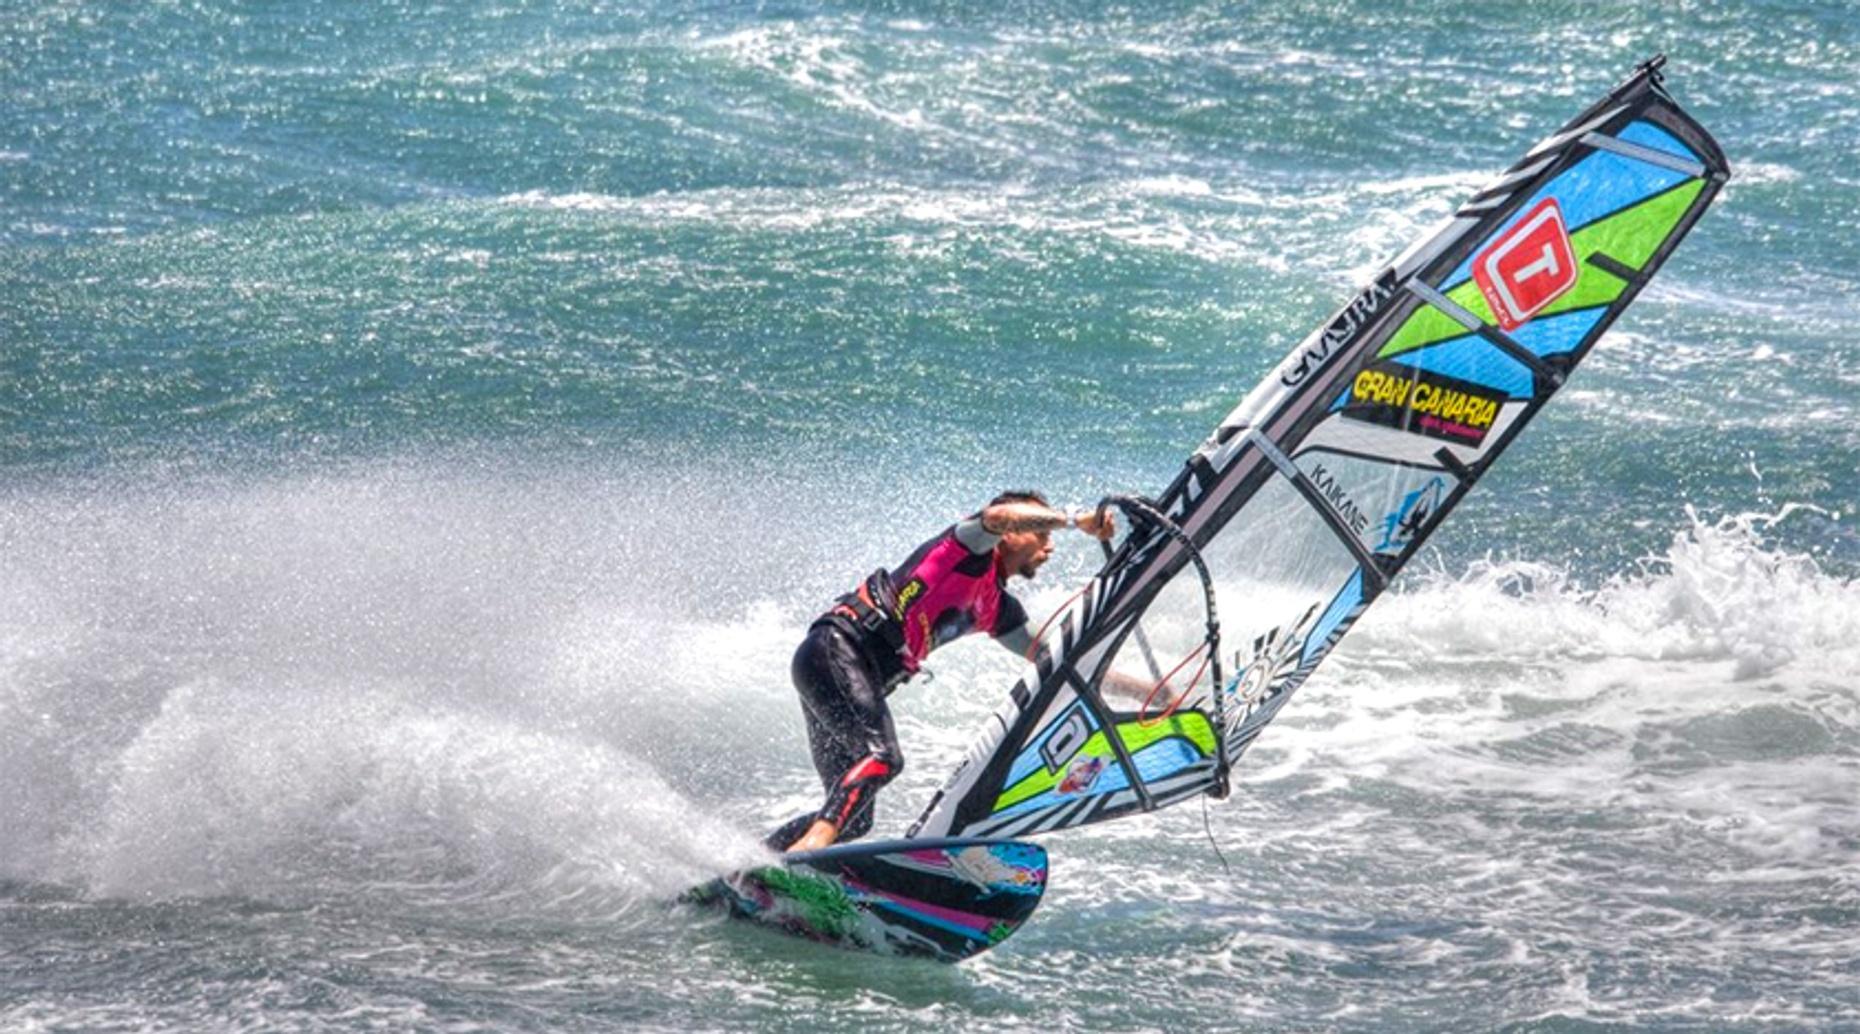 Jersey Beginner Windsurfing Lesson